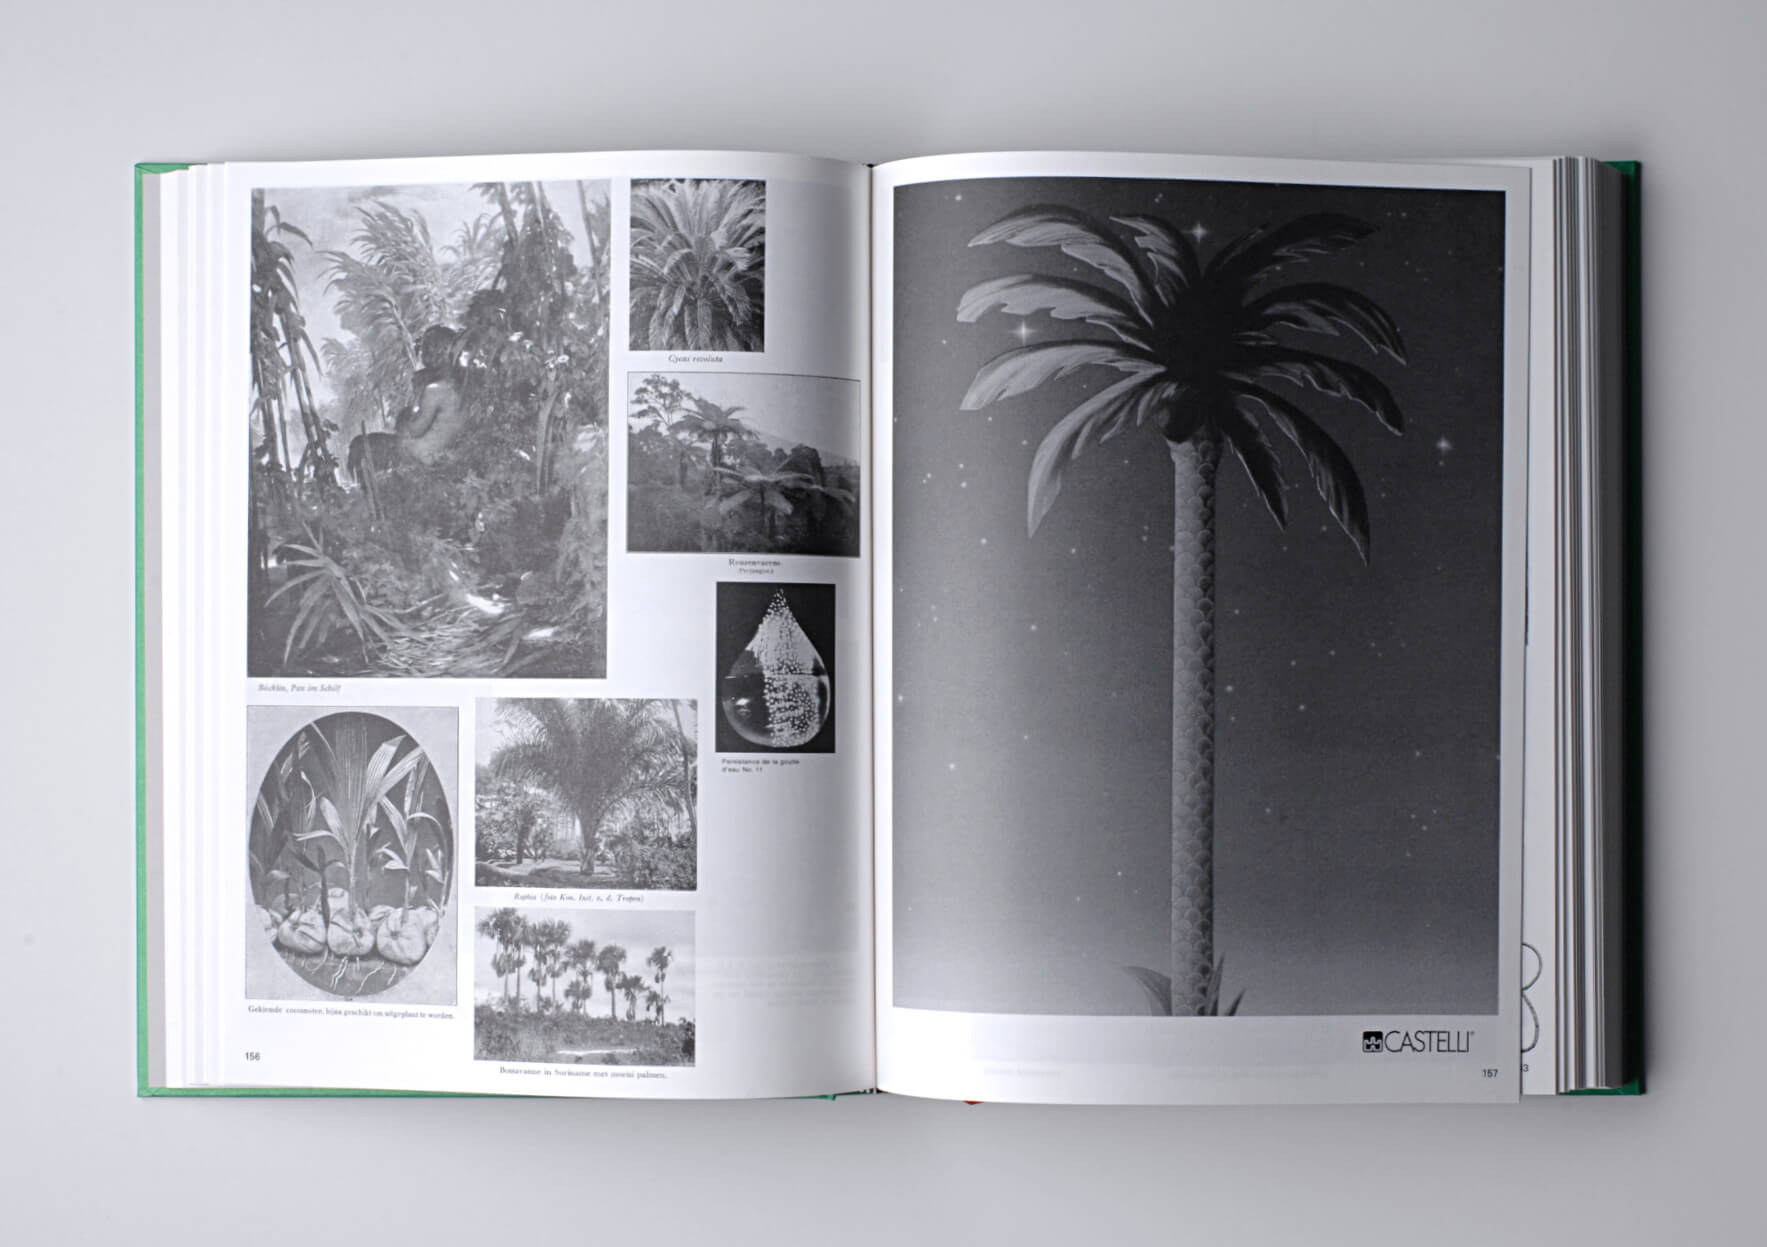 Batia Suter Parallel Encyclopedia 2, 2016/18 28,6 x 21,6 cm, 592 p. Ed. Roma Publications | Mother | ProjecteSD